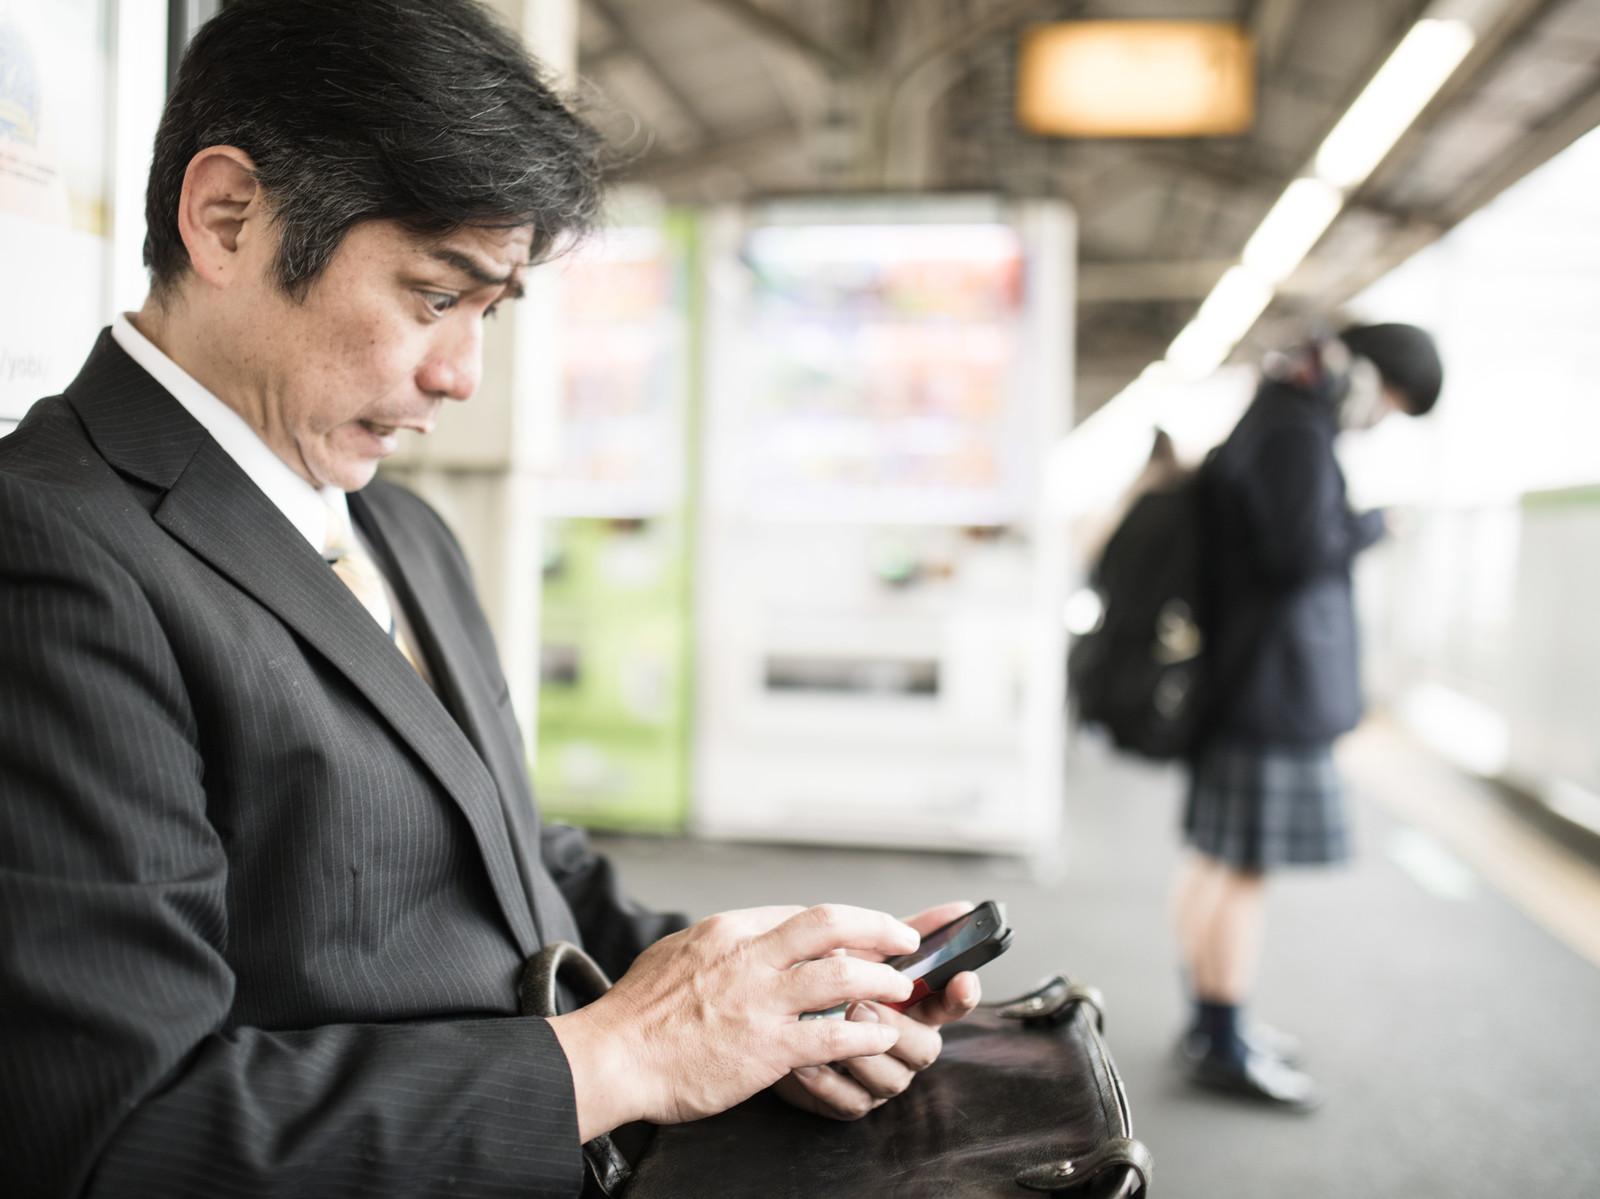 Yahoo!JAPANカードの支払日に残高不足で引き落としされなかった時の対処法